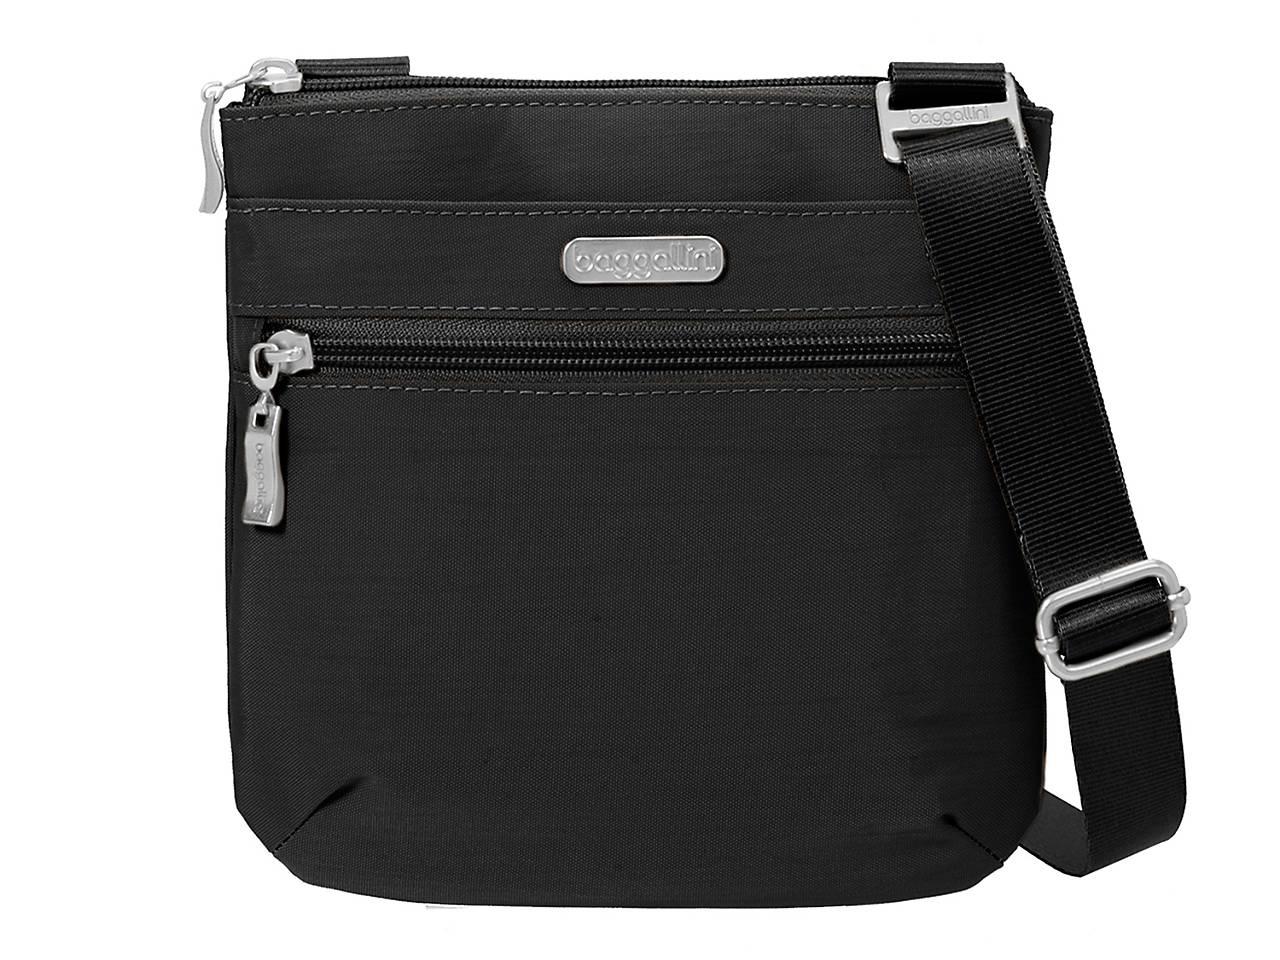 Baggallini Small Zip Crossbody Bag Women s Handbags   Accessories